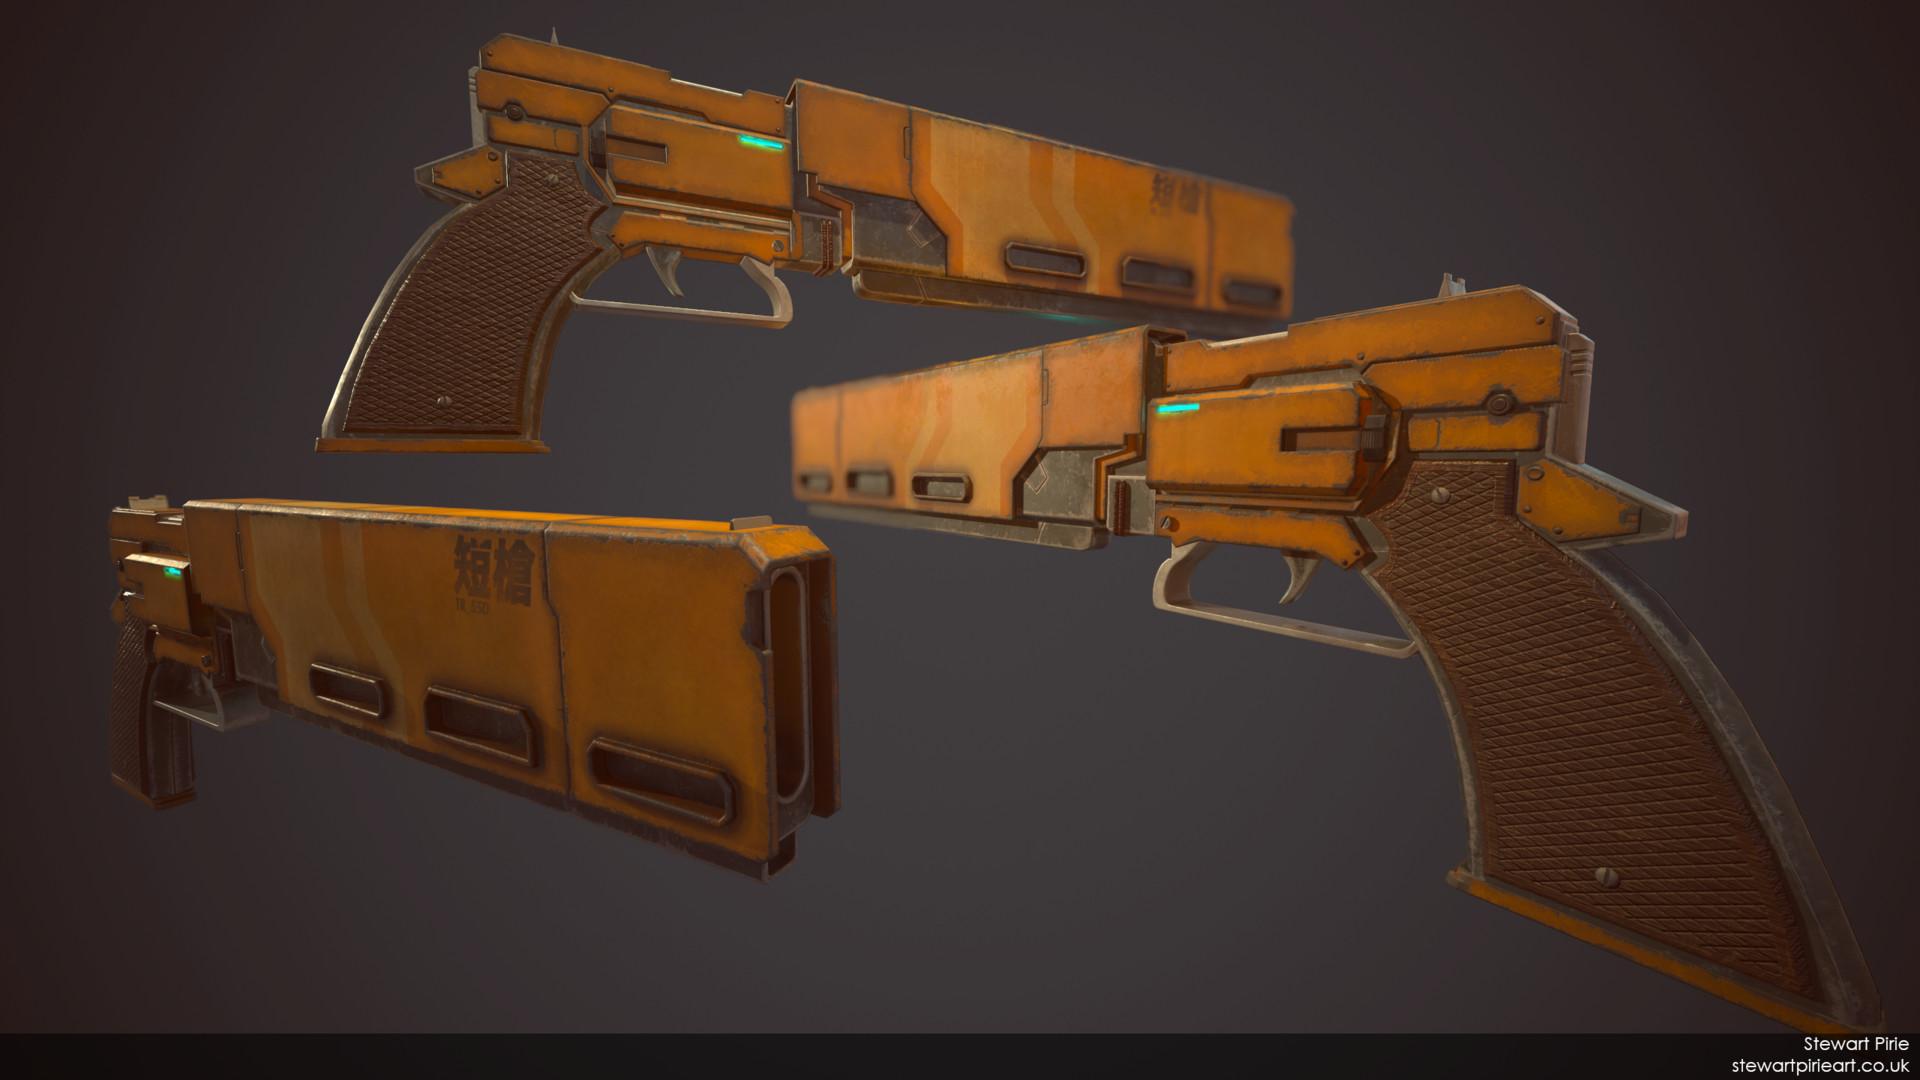 Stewart pirie gun shot 05